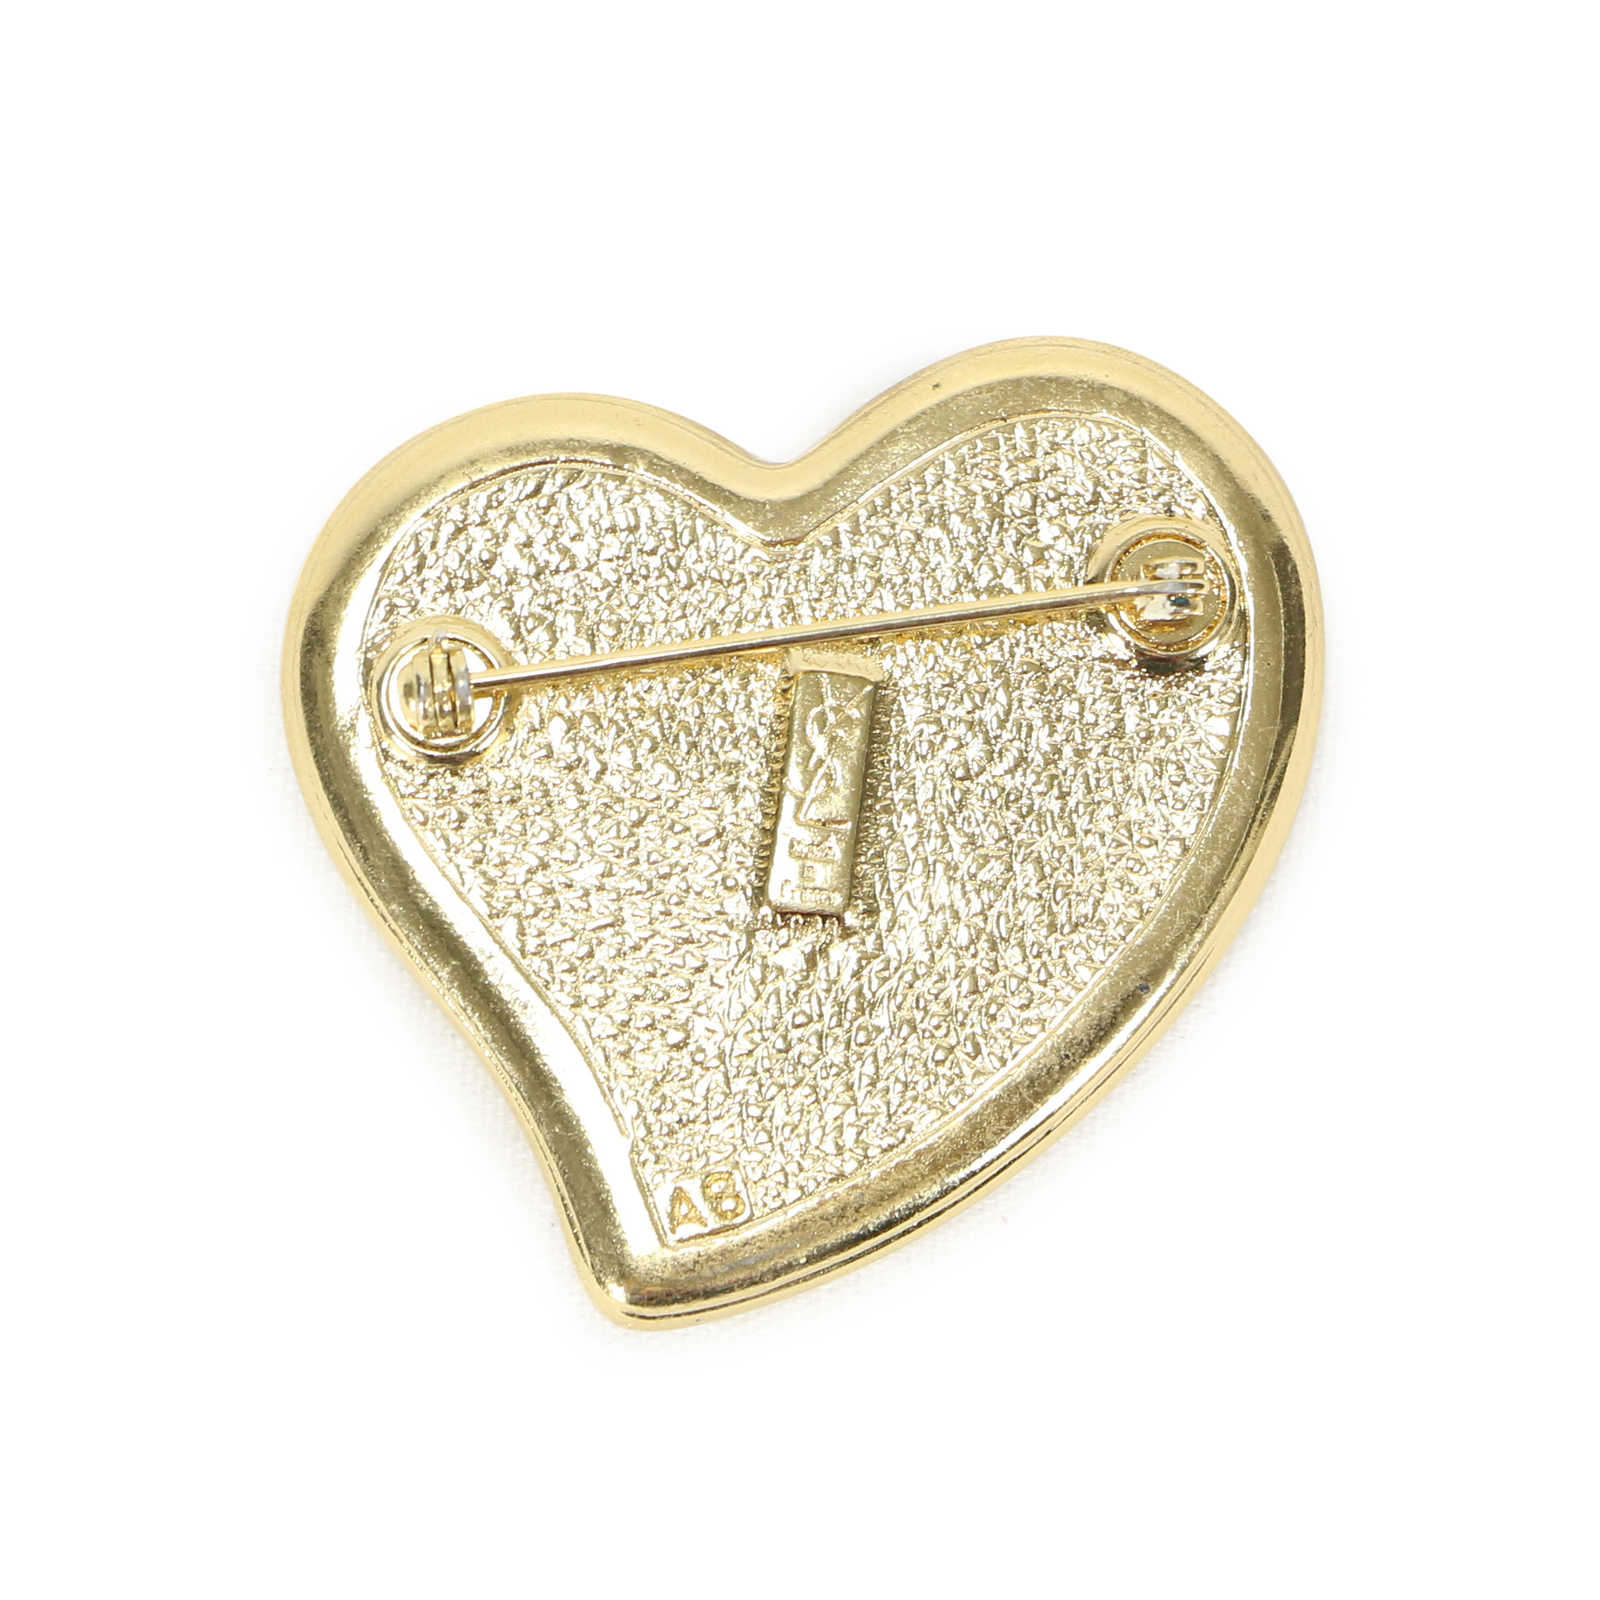 Authentic Vintage Yves Saint Laurent Wood Heart Brooch